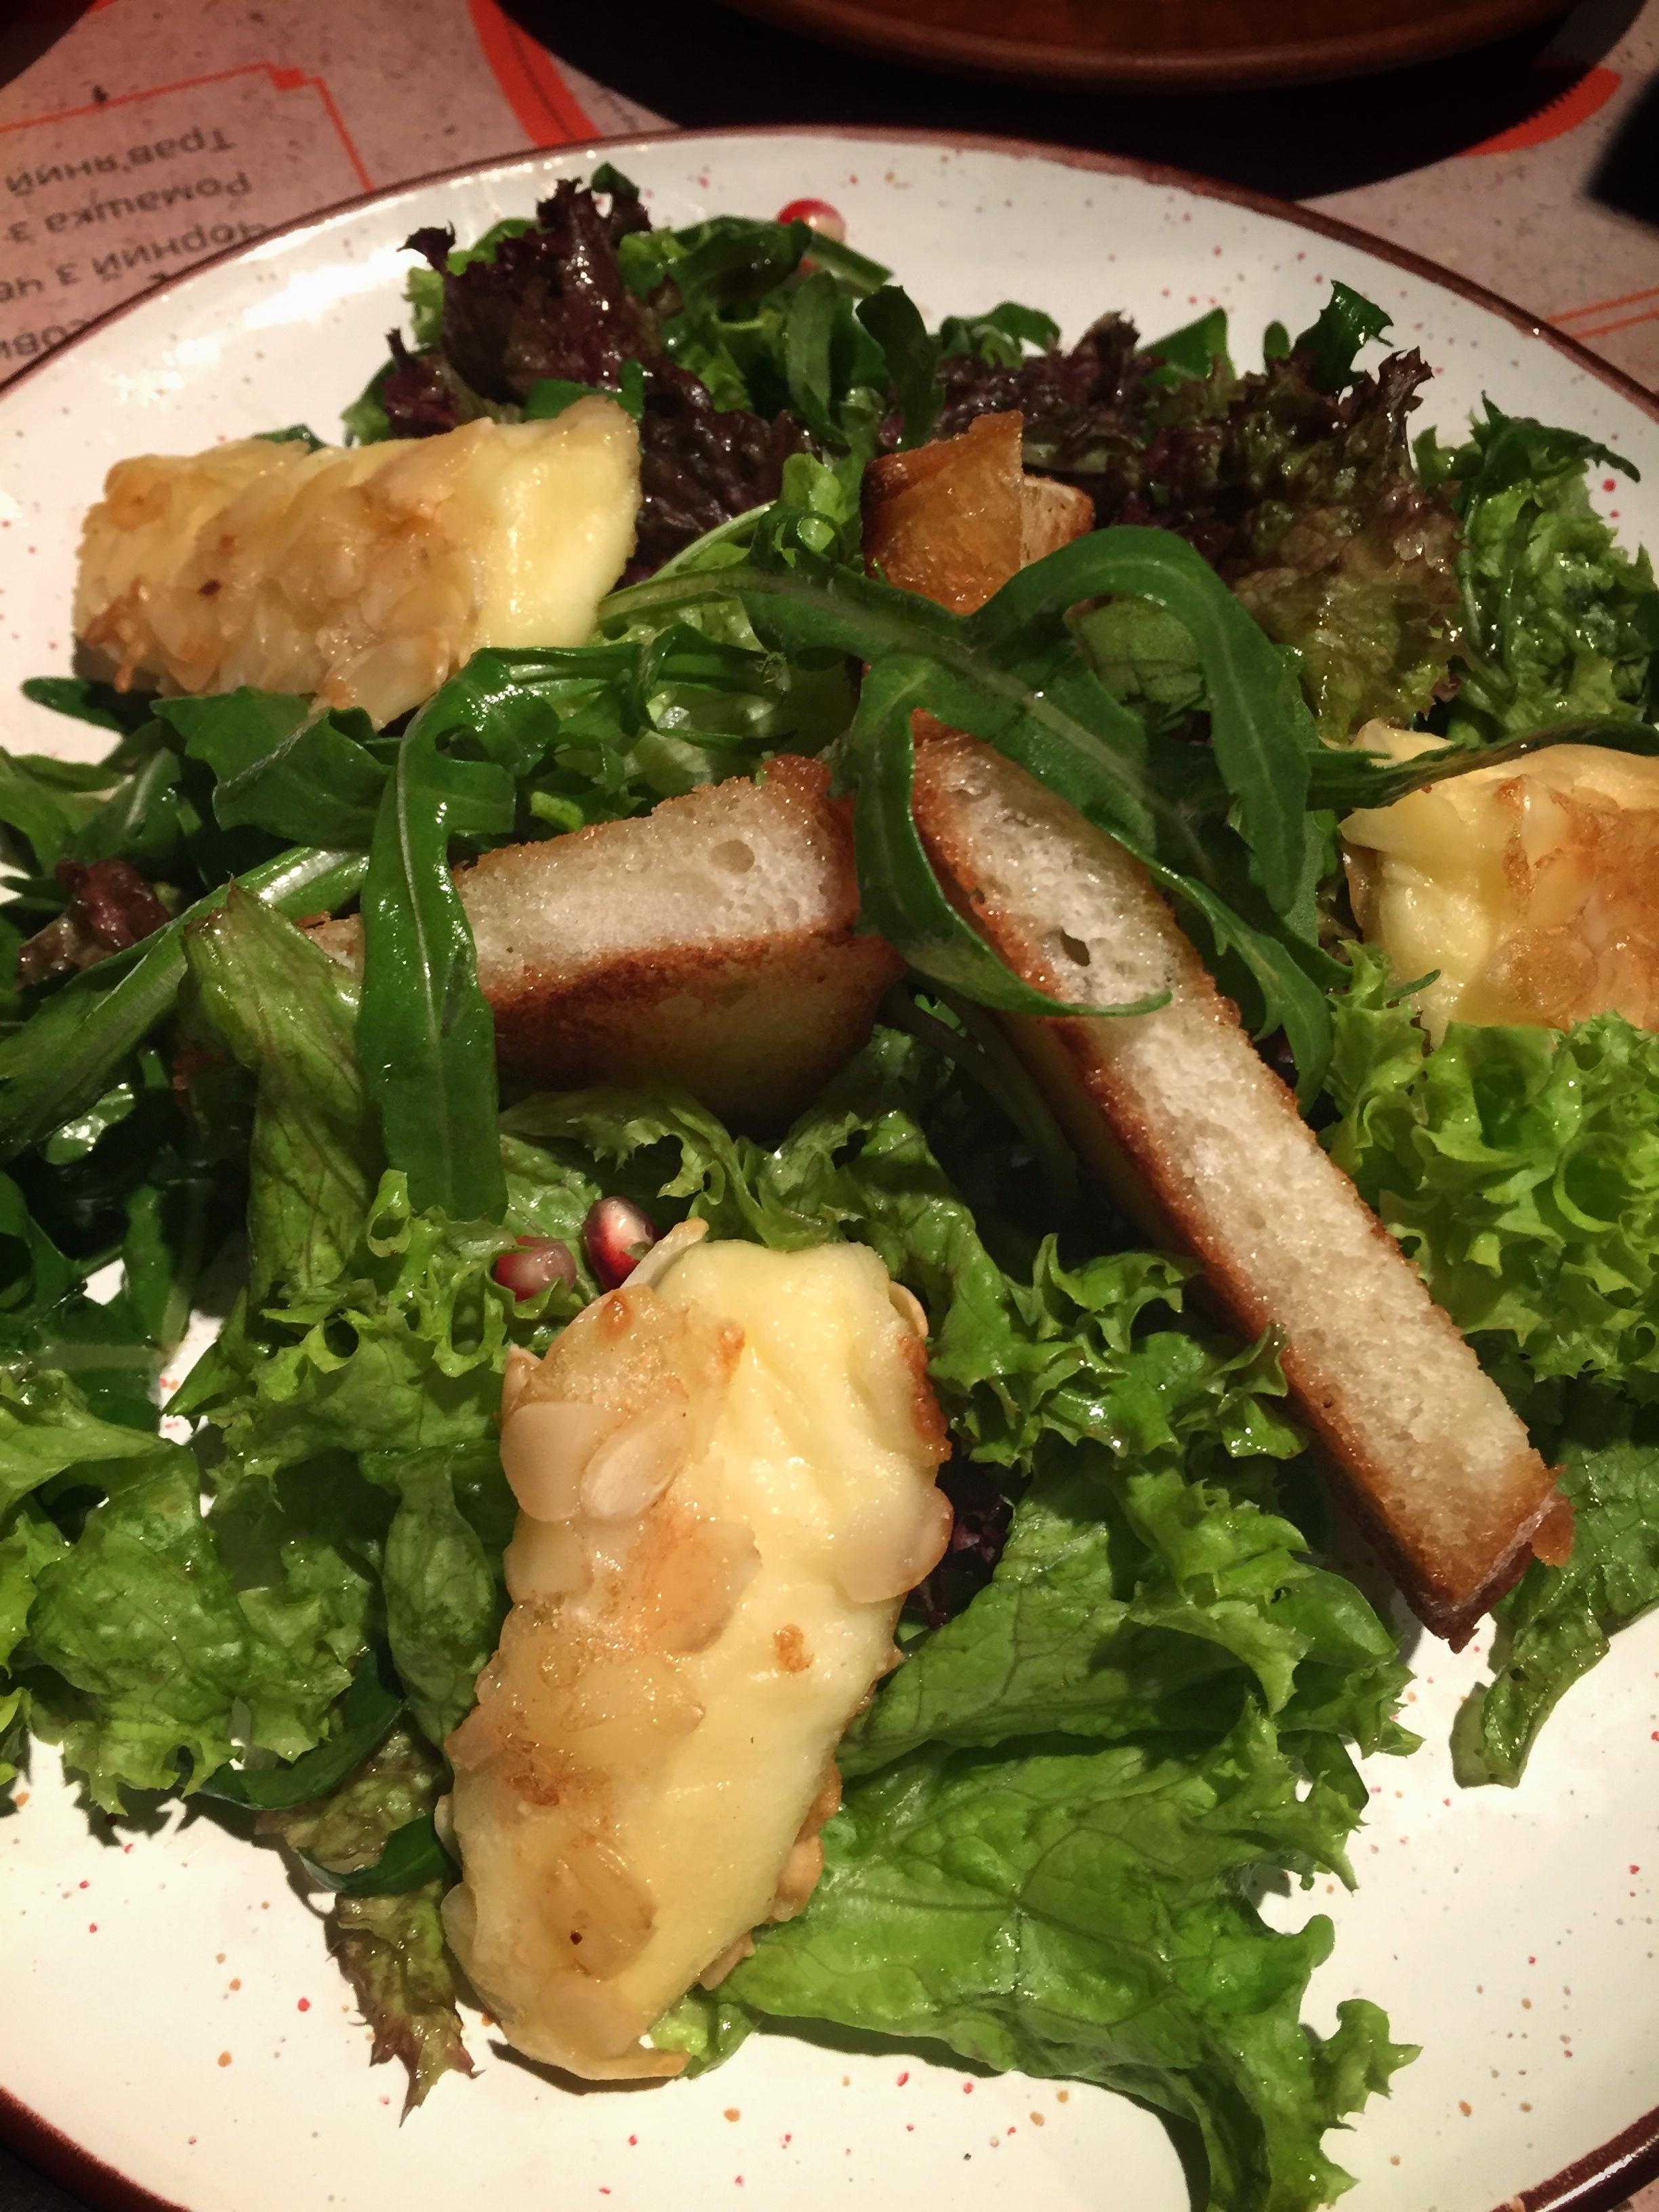 Georgian salad with cheese